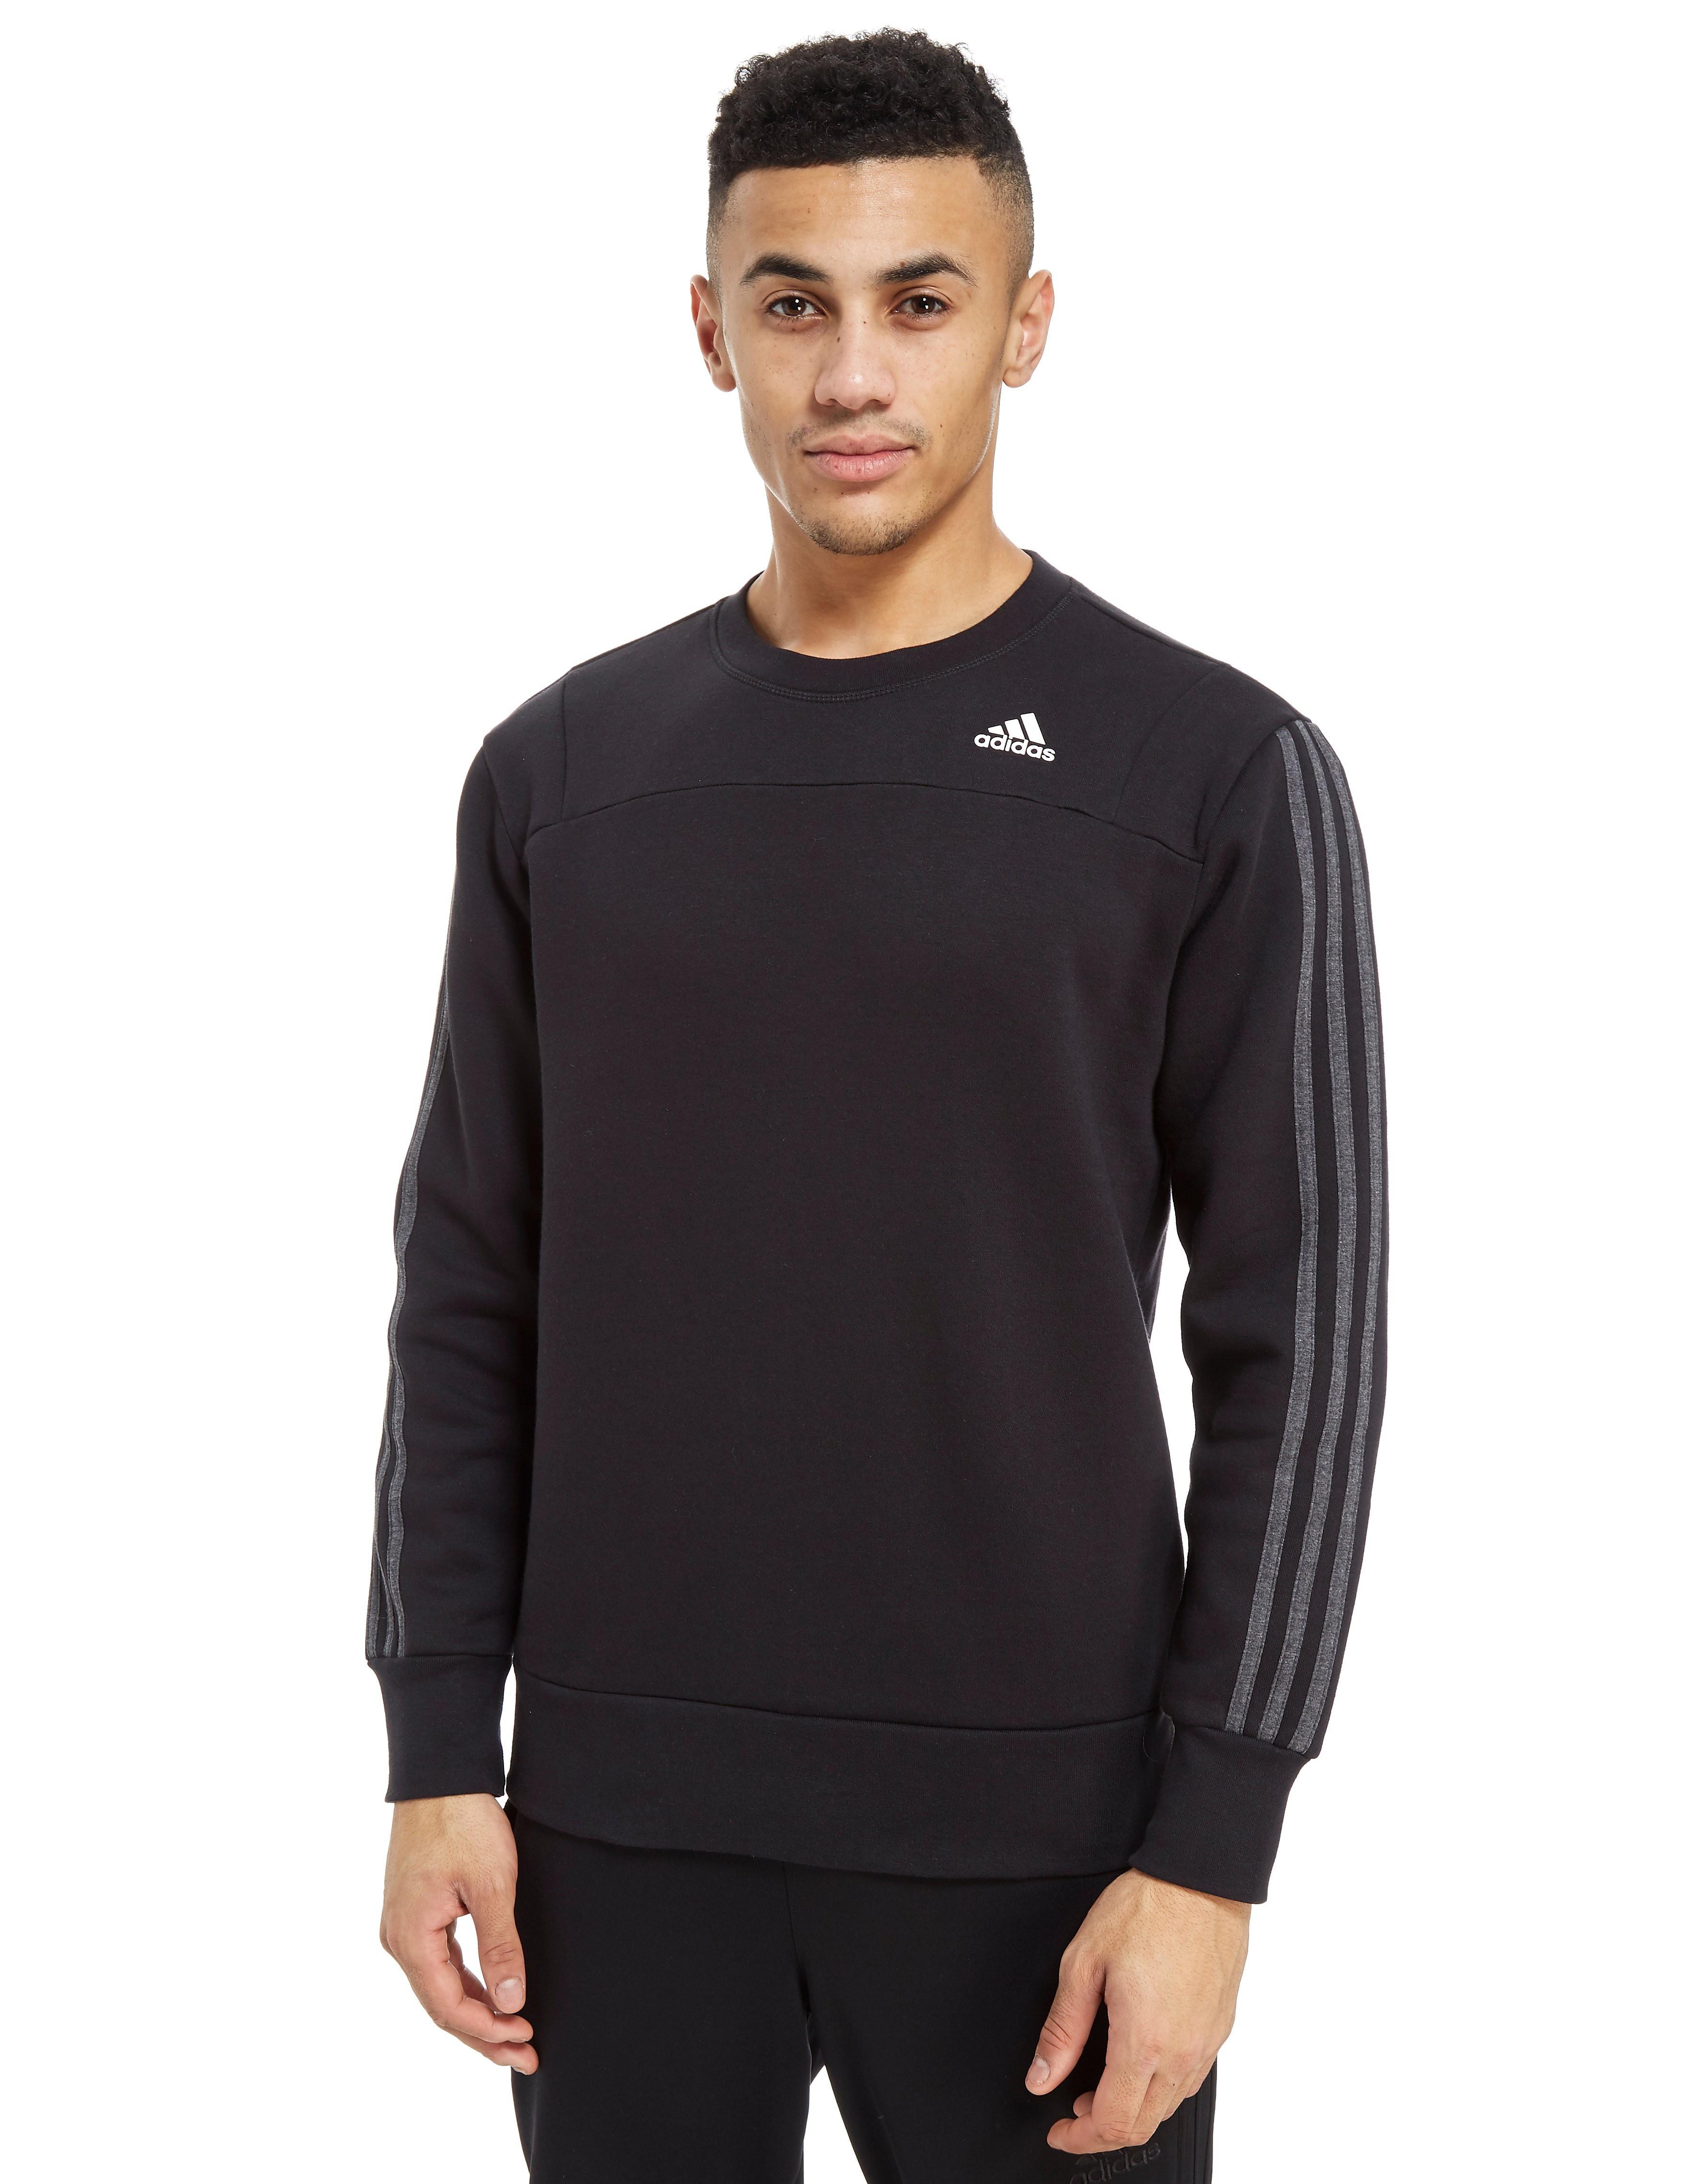 adidas 3-Stripes Essentials Crew Sweatshirt